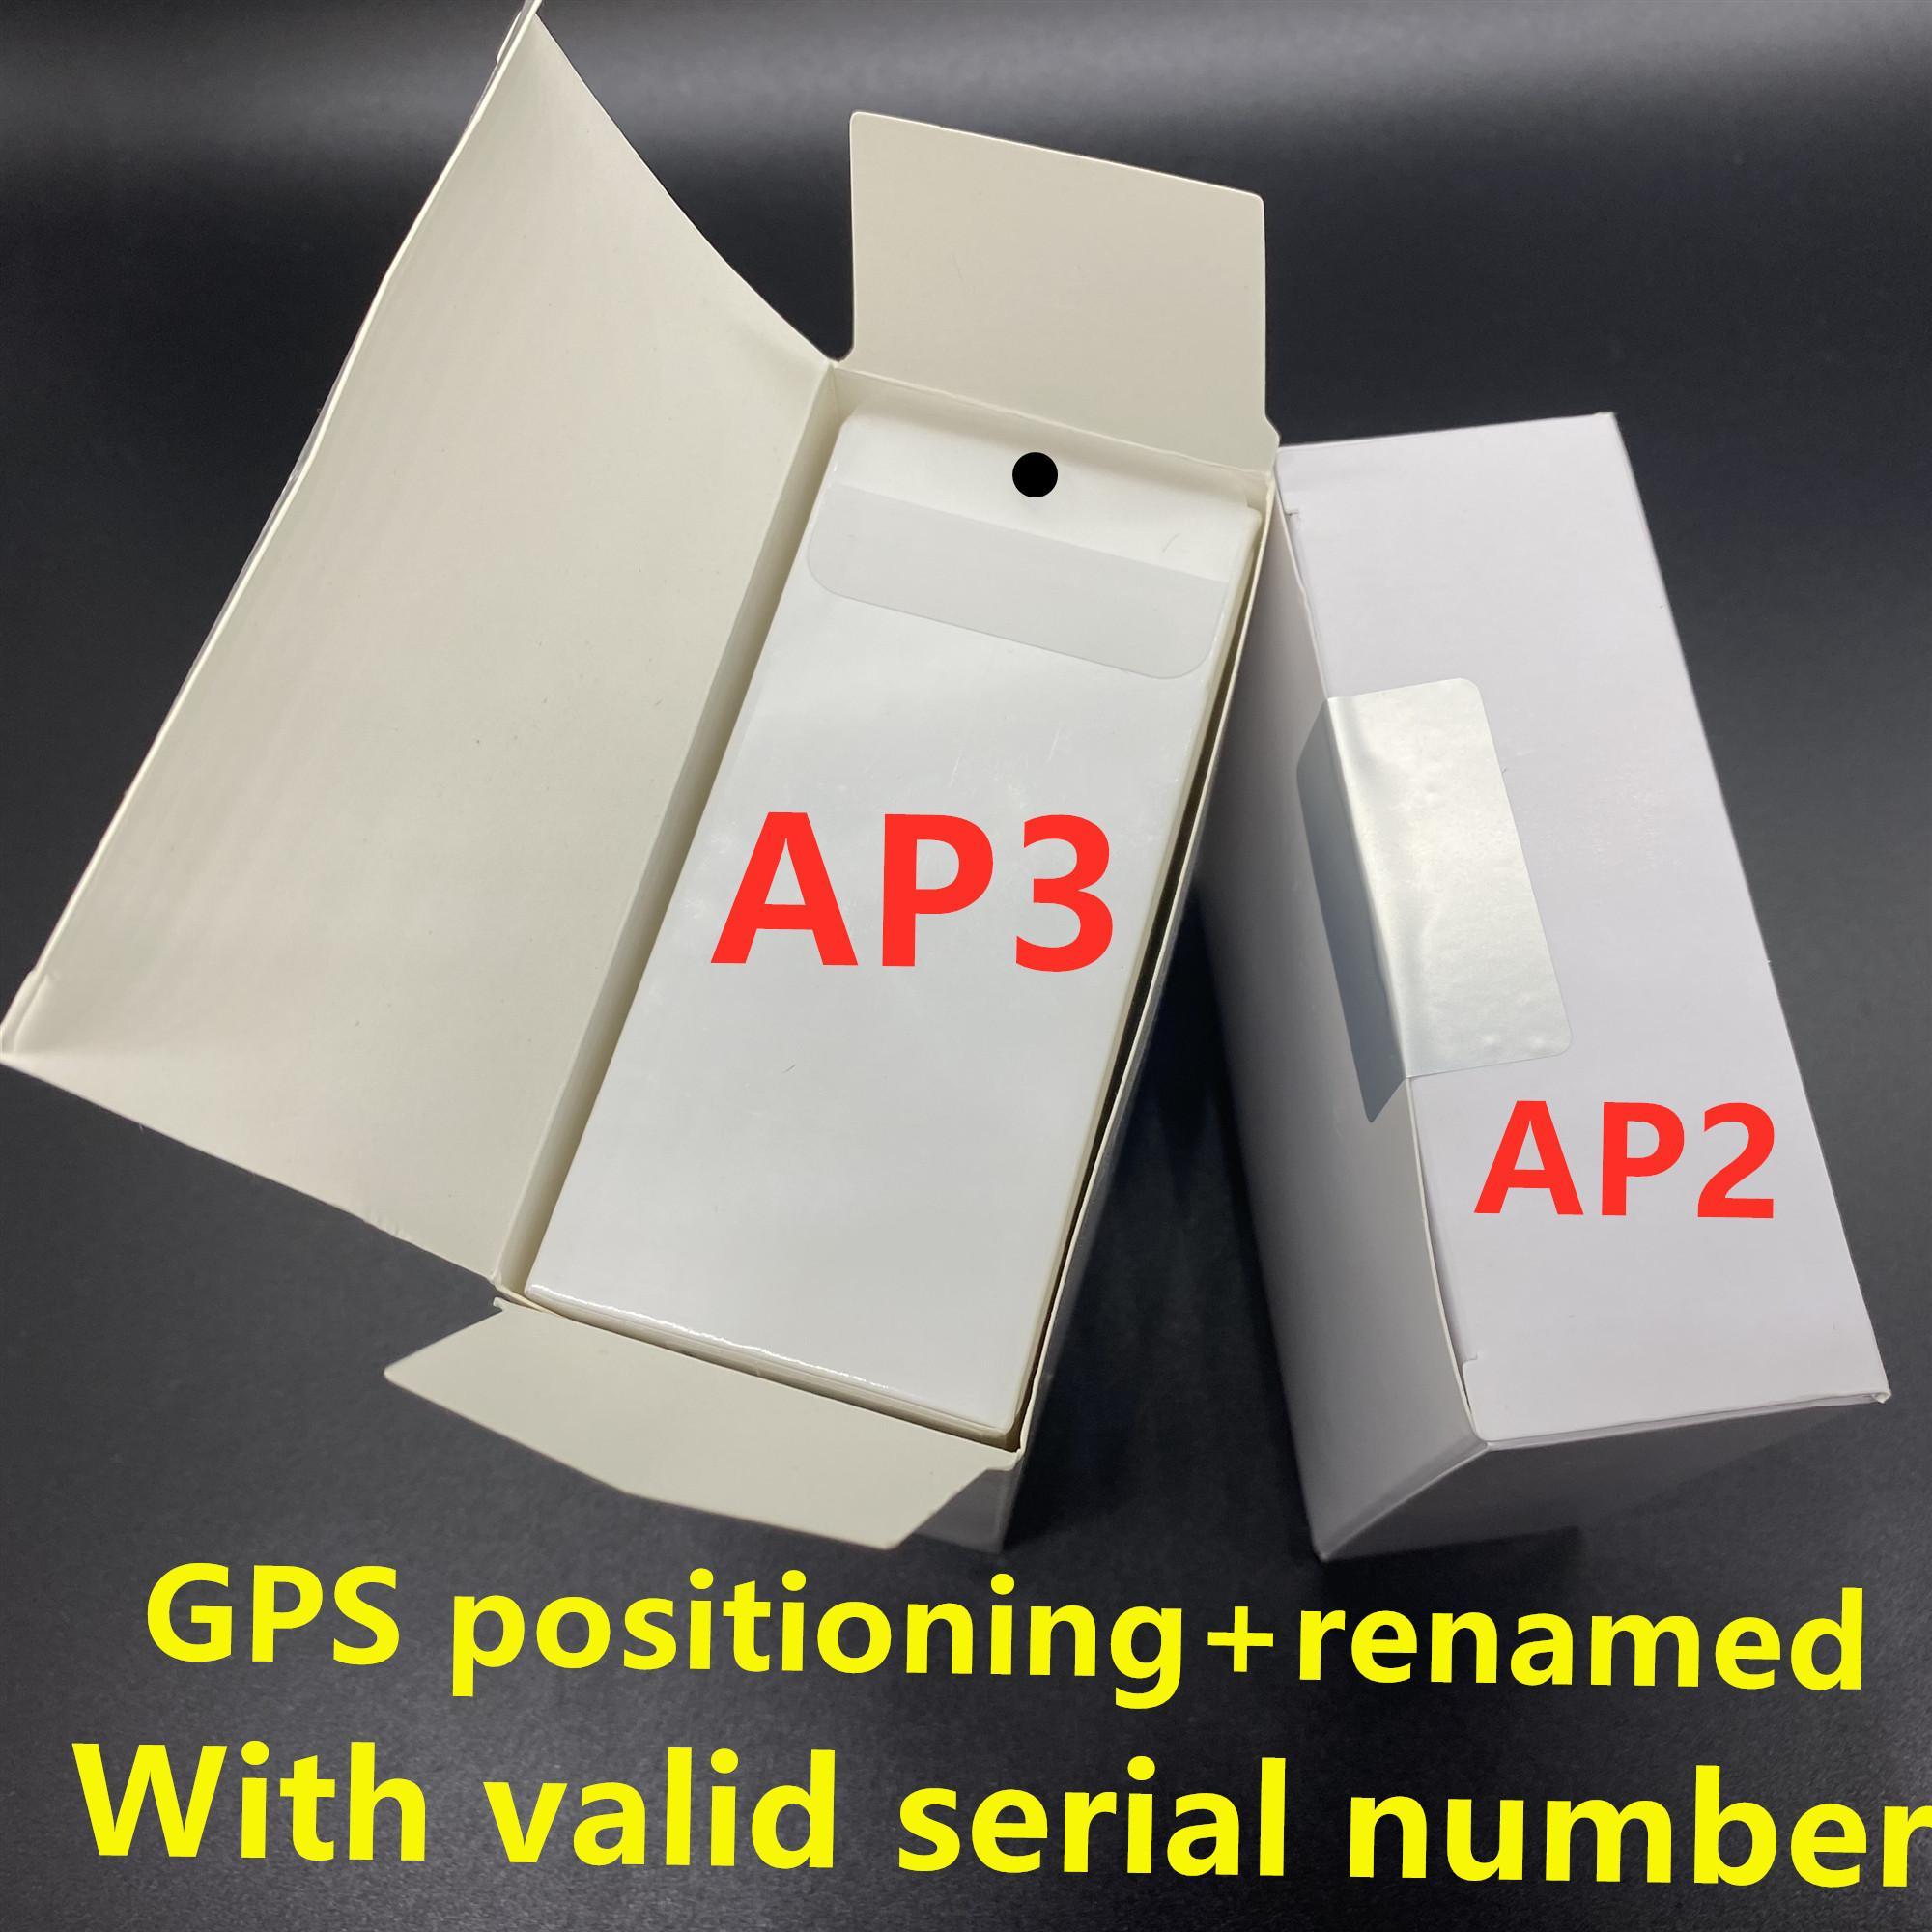 5 unids DHL UPS Free H1 Auriculares Chip GPS Rename AIR AP3 PRO AP2 TWS GEN 2 PODERS Pop Up Window Bluetooth Auriculares Auto Partir Wireles Carga